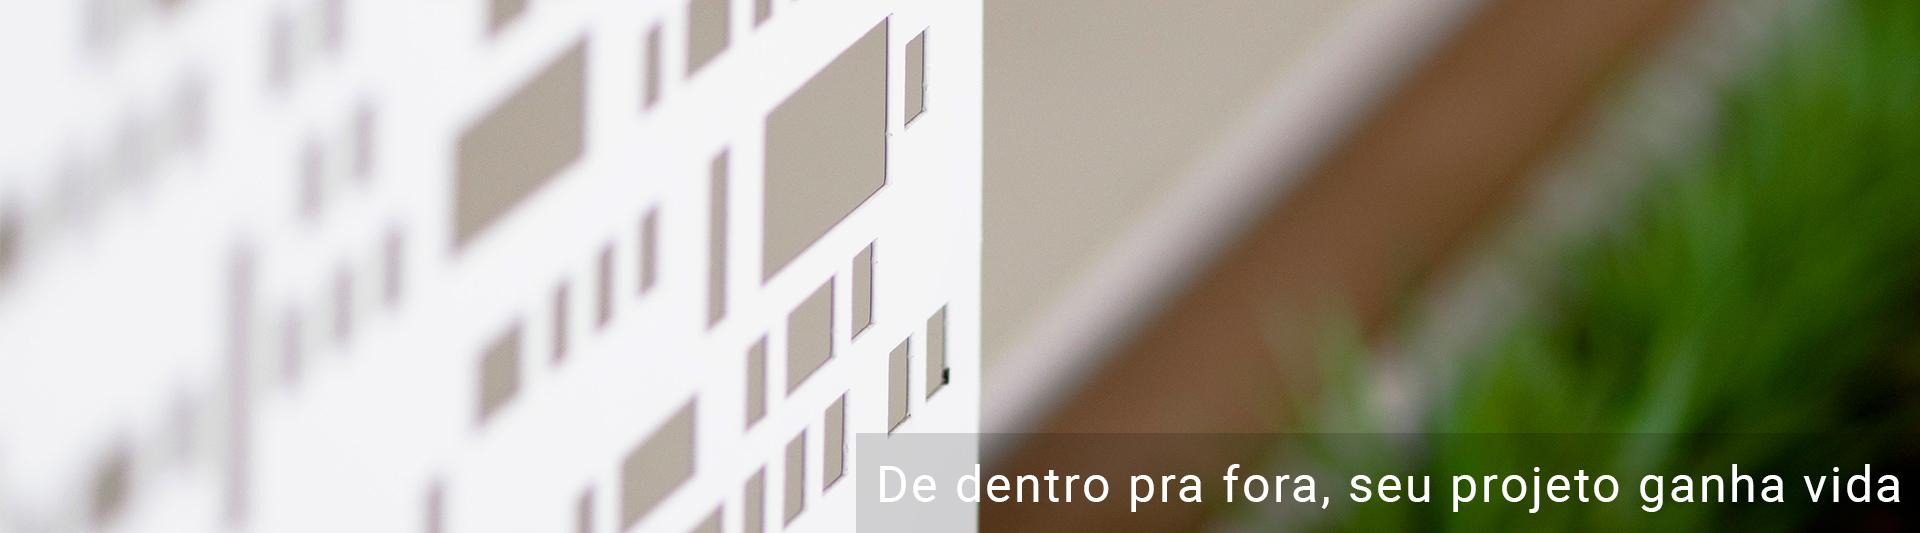 Banner desktop 4